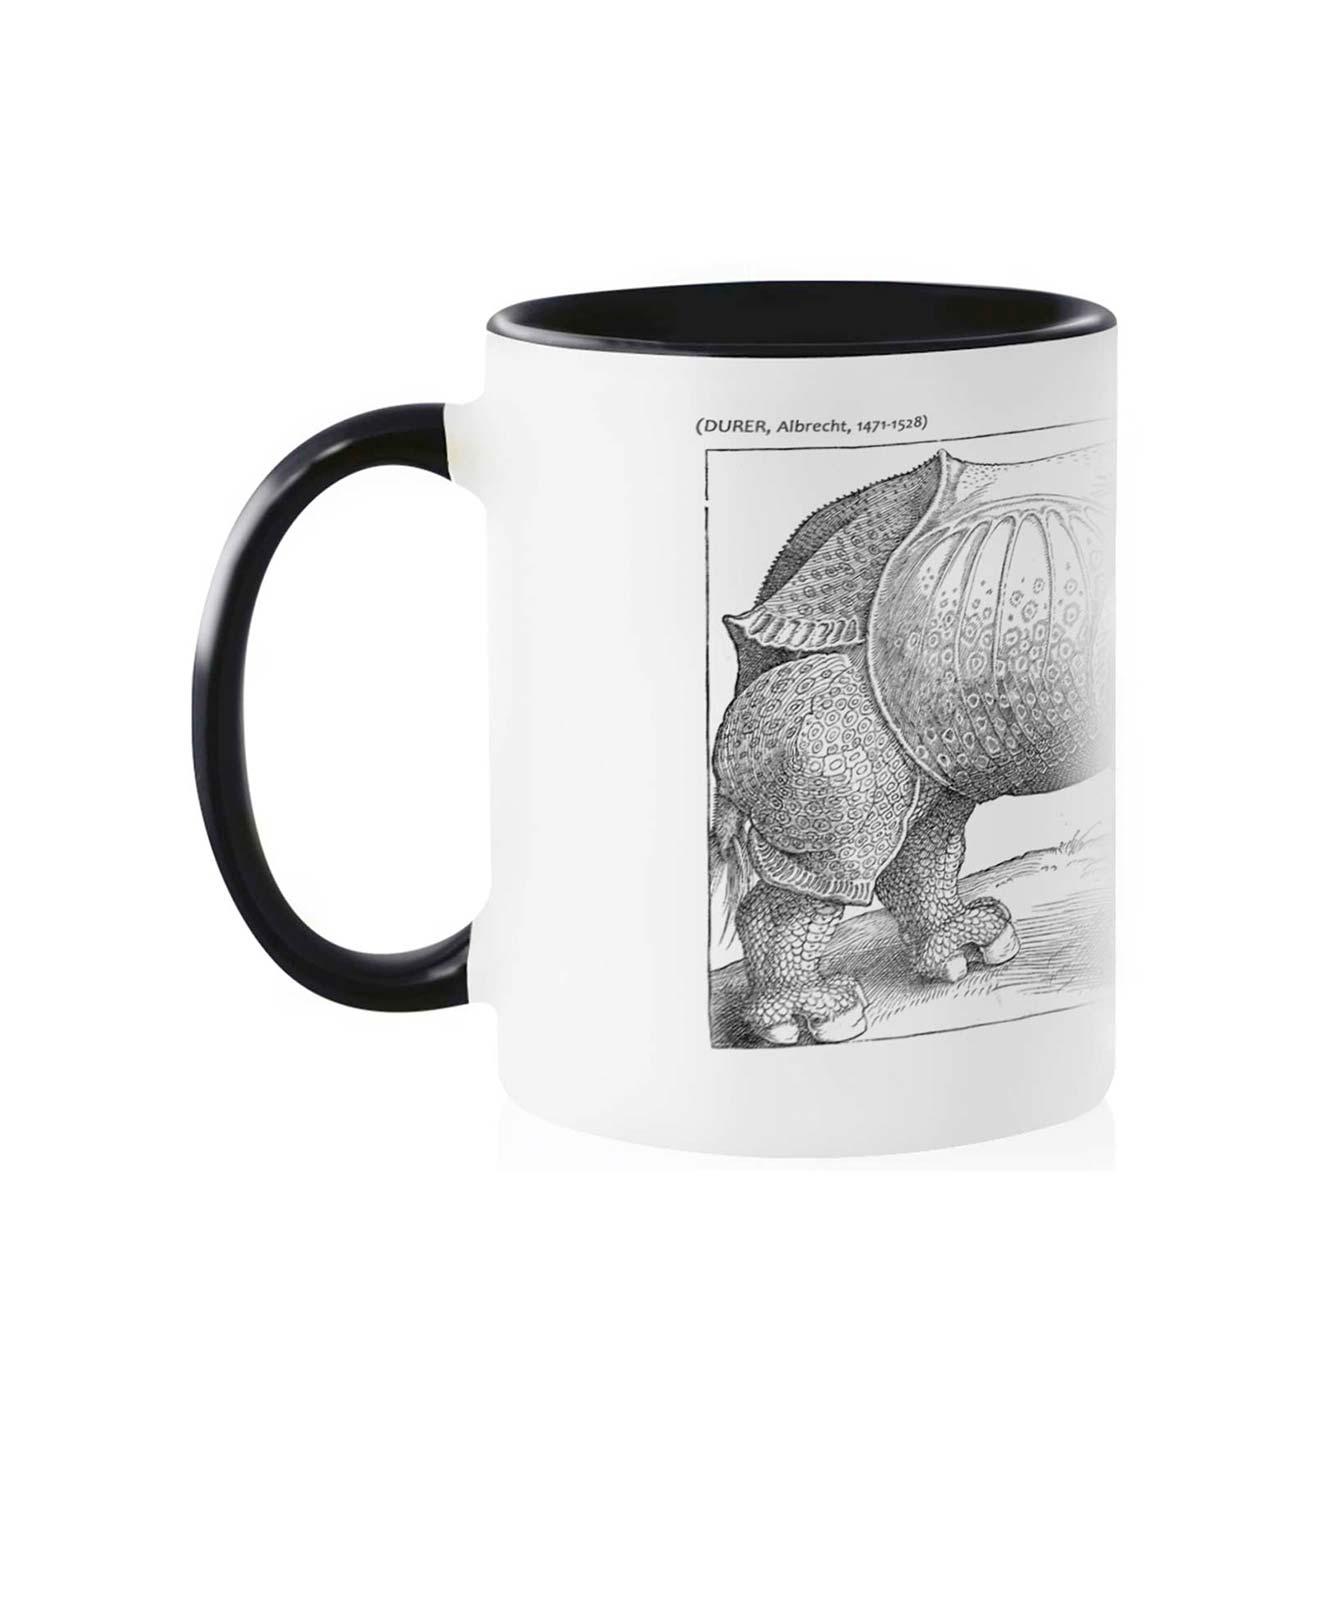 Rhinocerus Ceramic White Mug